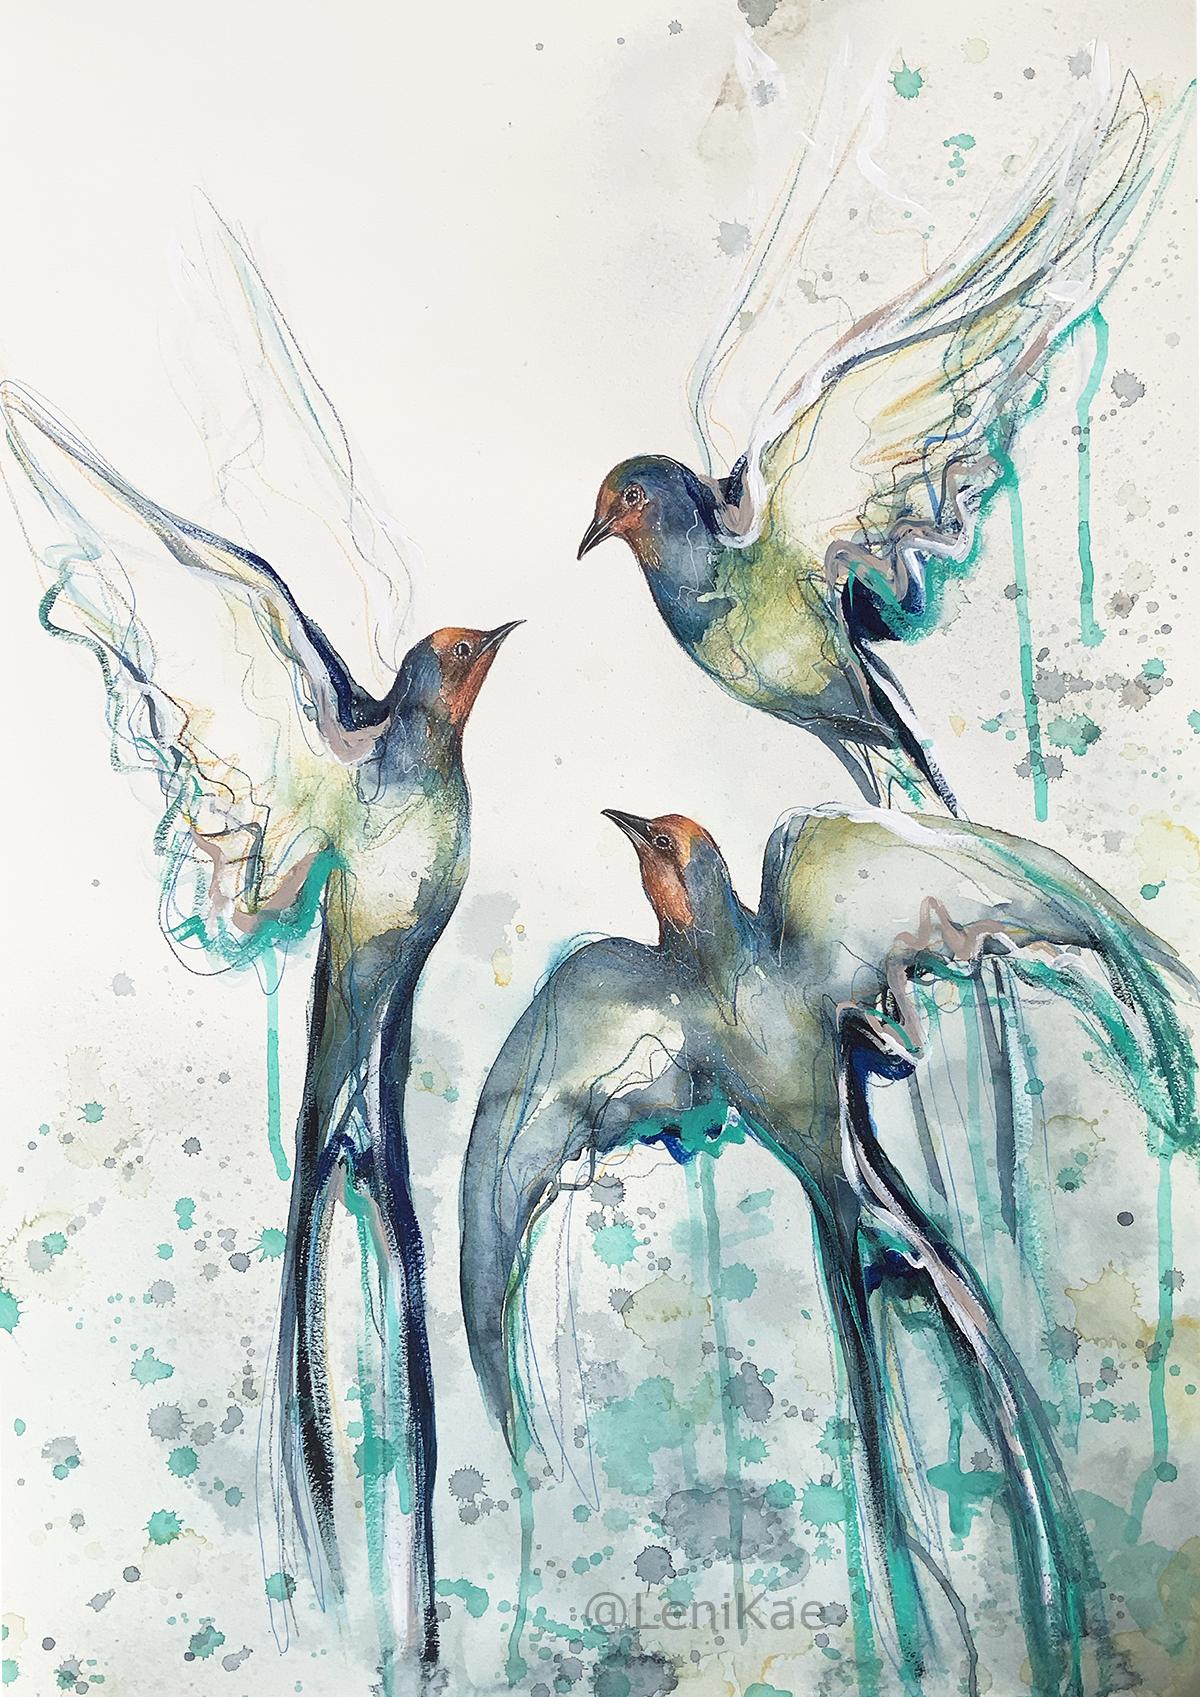 1a.sydney Artist Leni Kae Flight Of The Swallows Bird Painting